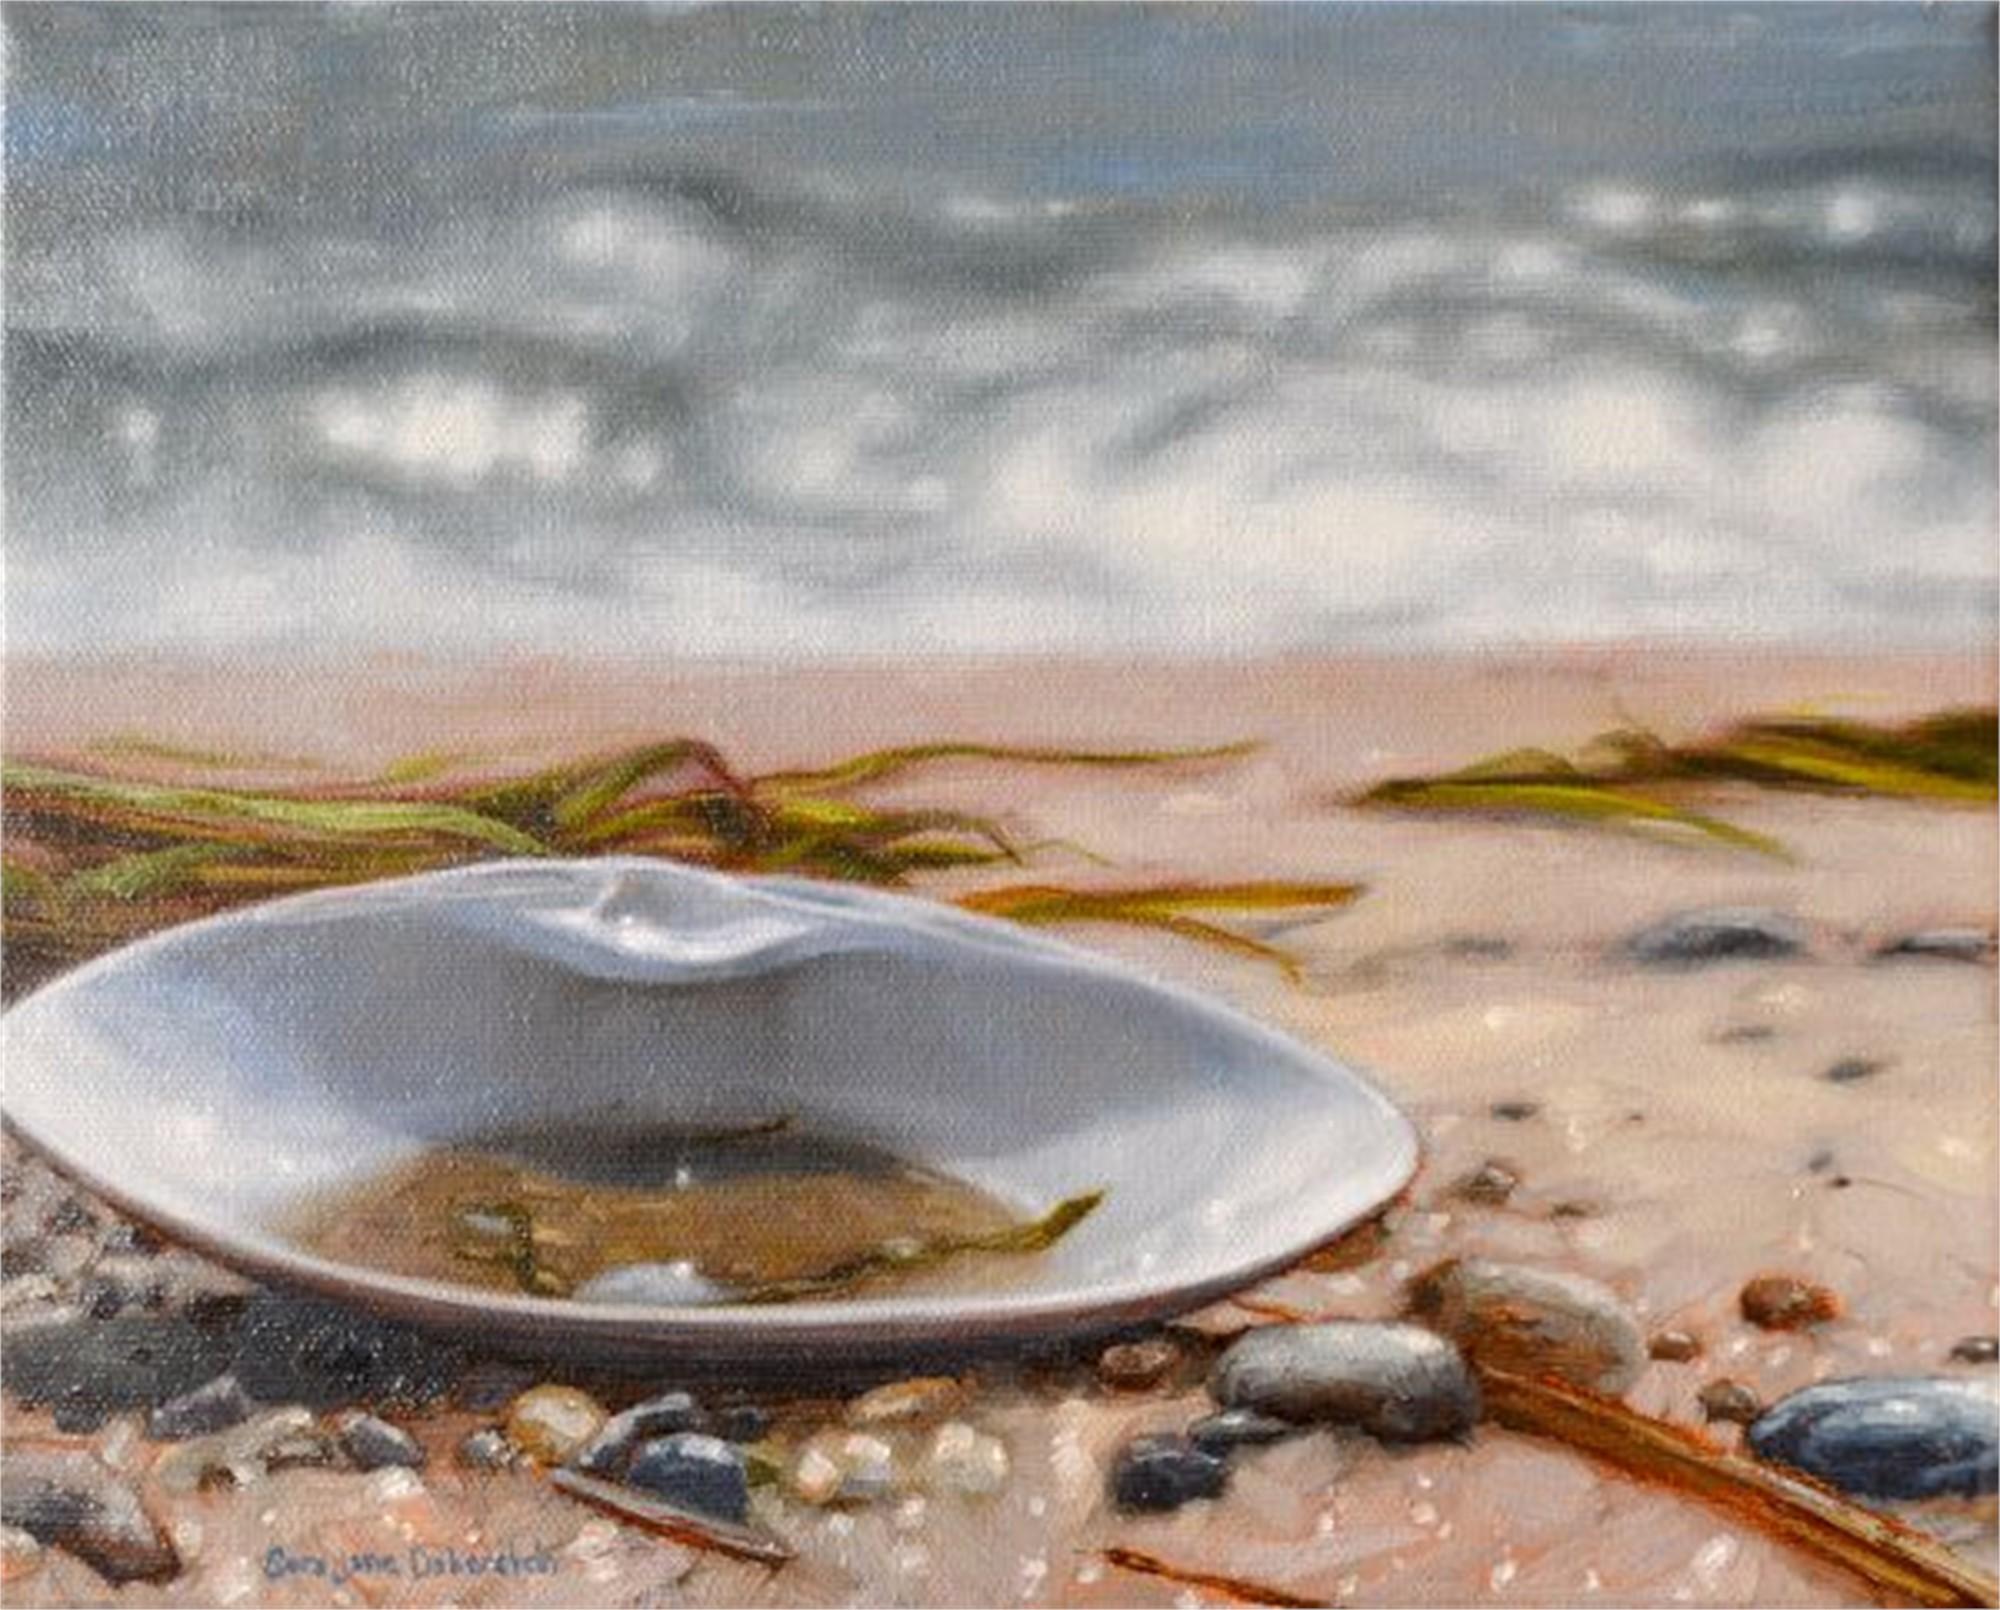 Dancing with Waves by Sara Jane Doberstein